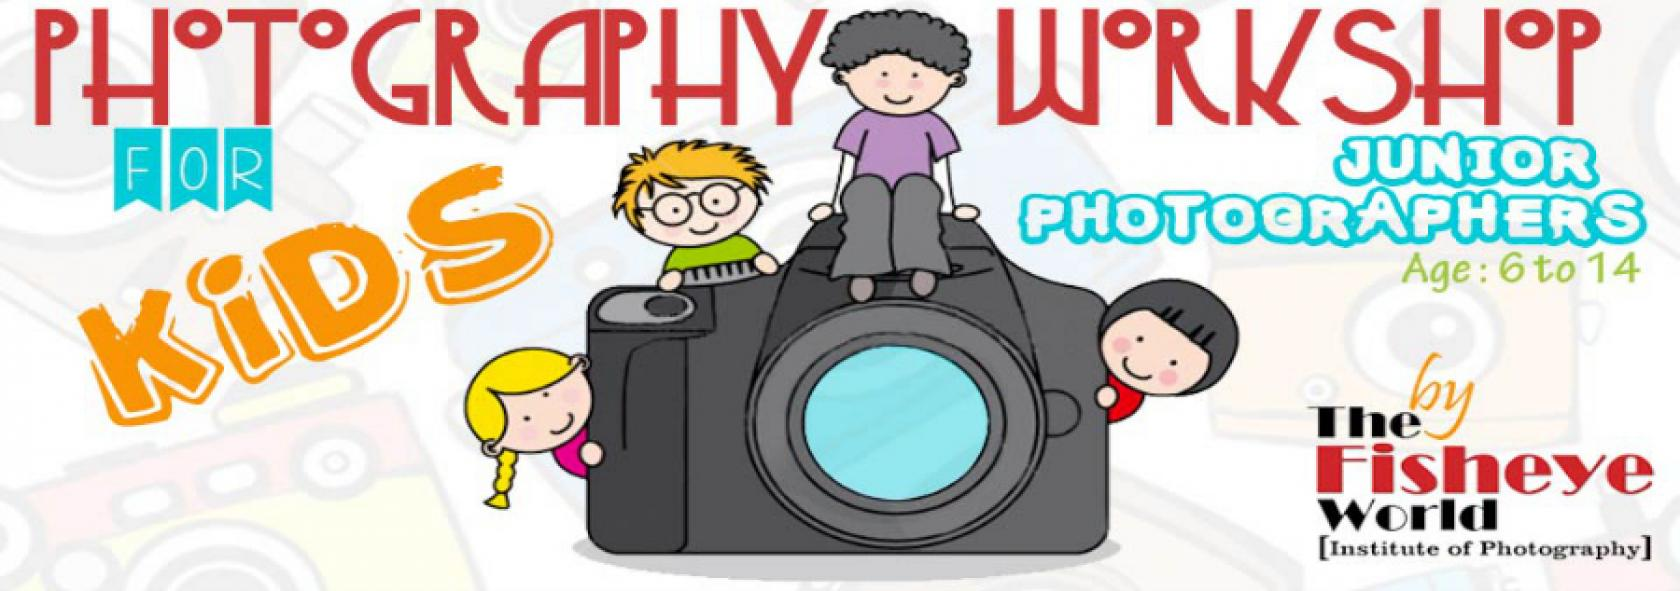 Junior Photography Workshop in Mumbai.